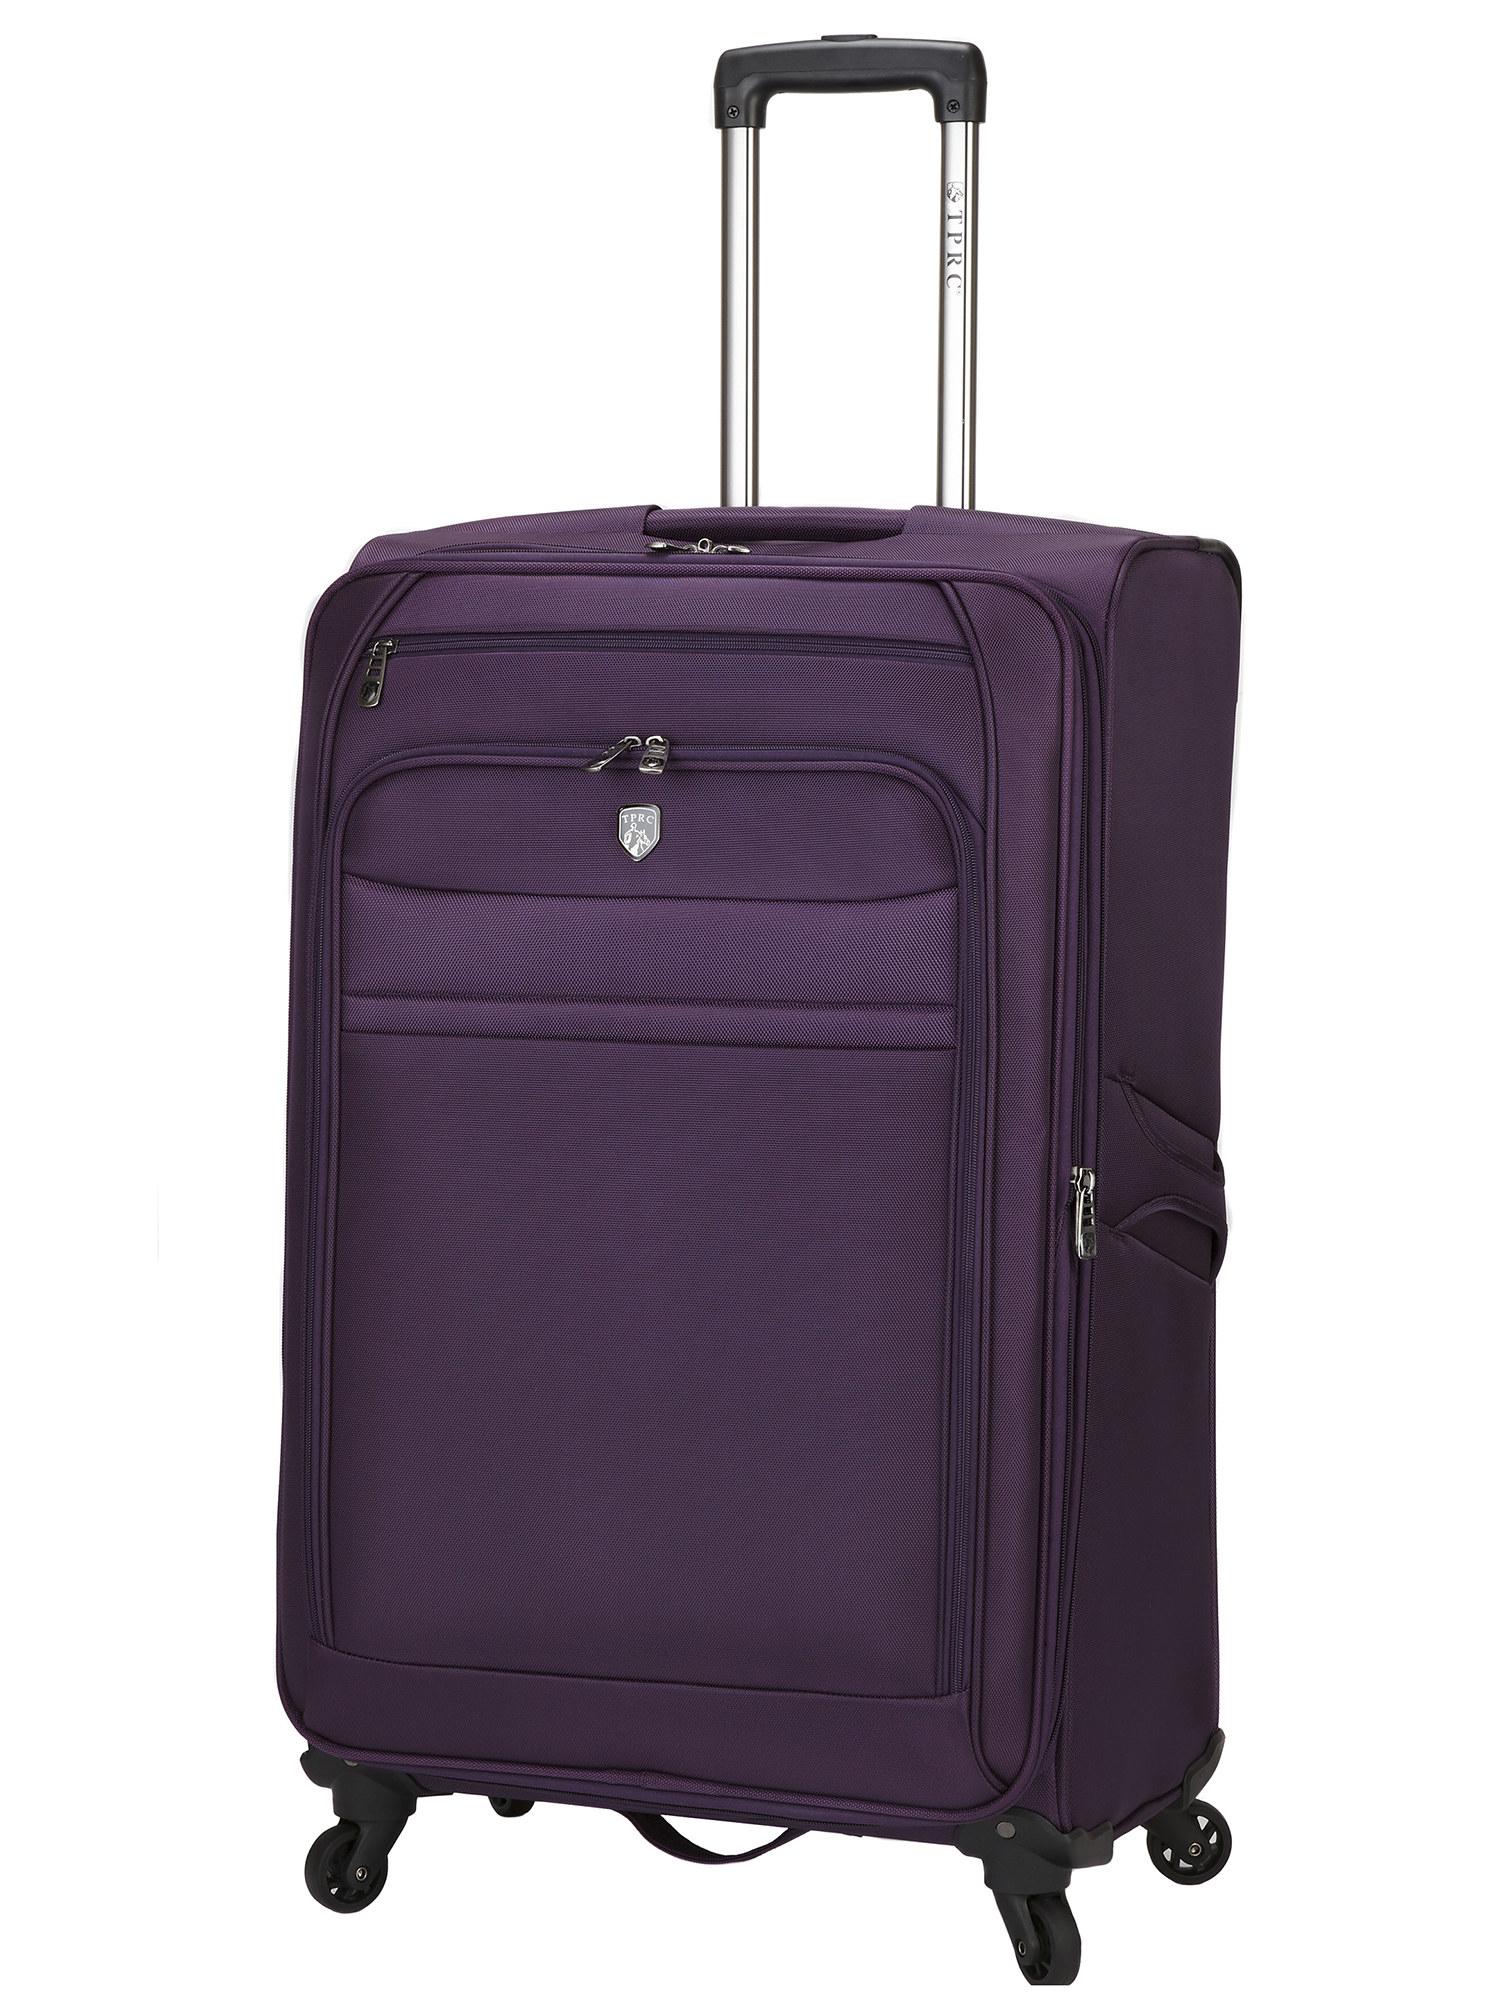 The purple wheeled suitcase